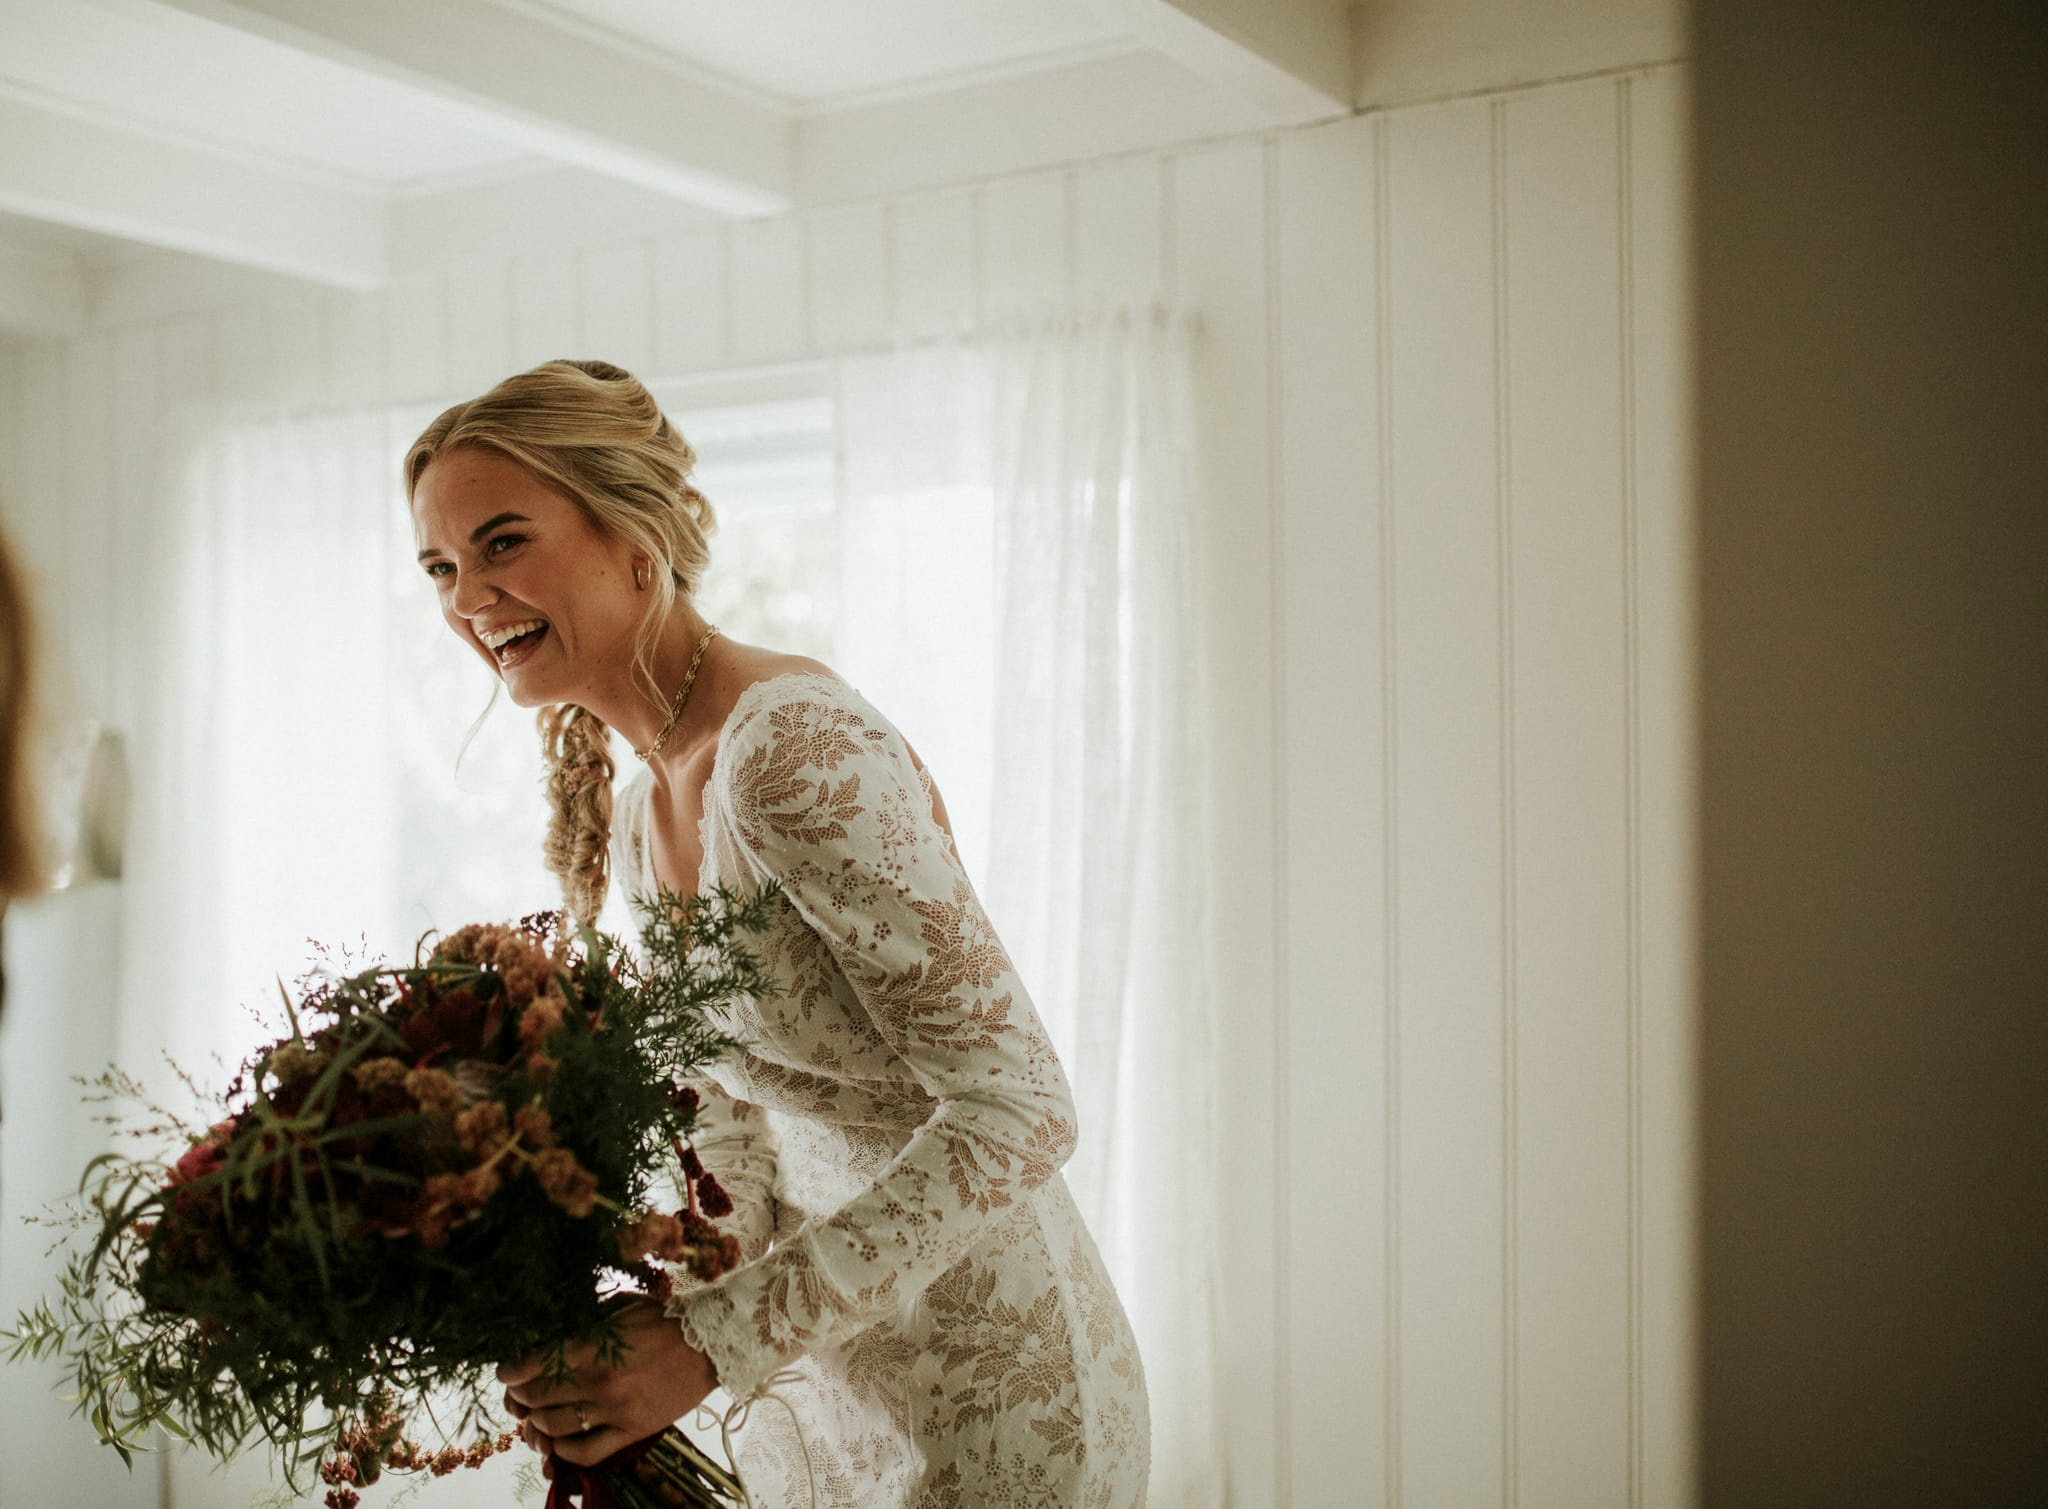 Norway-wedding-photographer-85.jpg